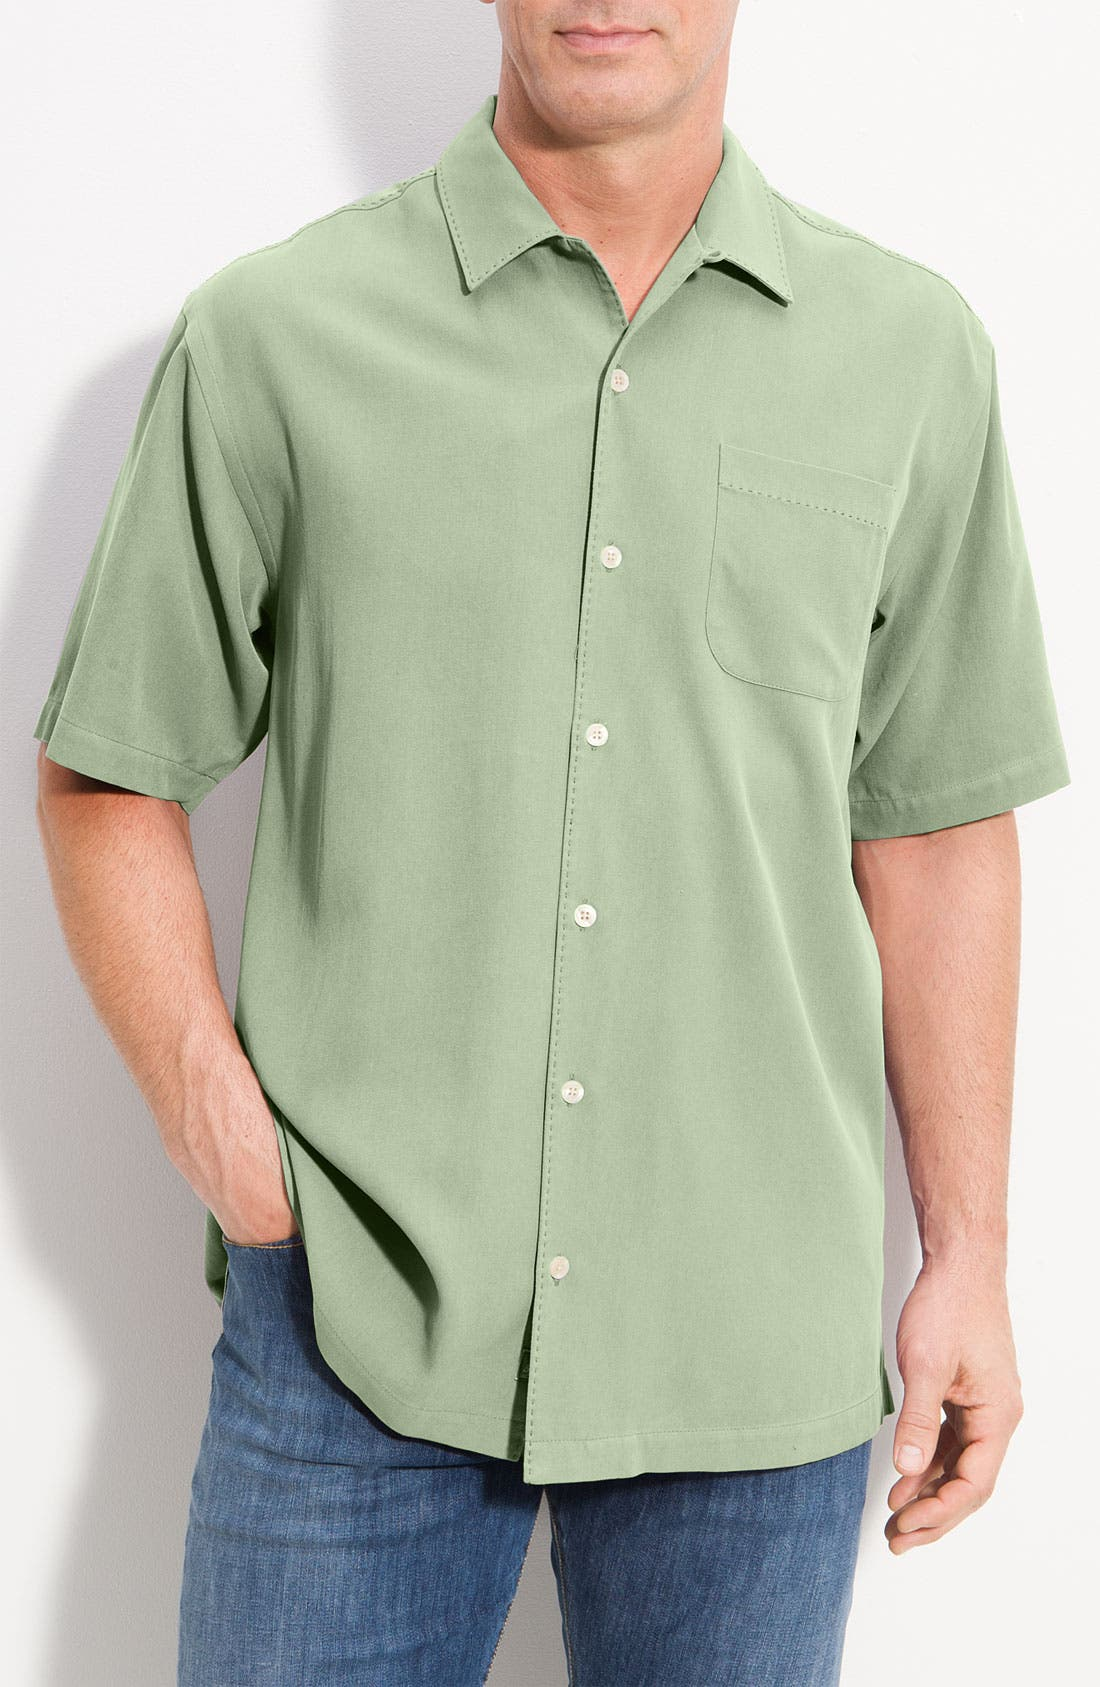 Main Image - Tommy Bahama 'Catalina Twill' Silk Camp Shirt (Big & Tall)